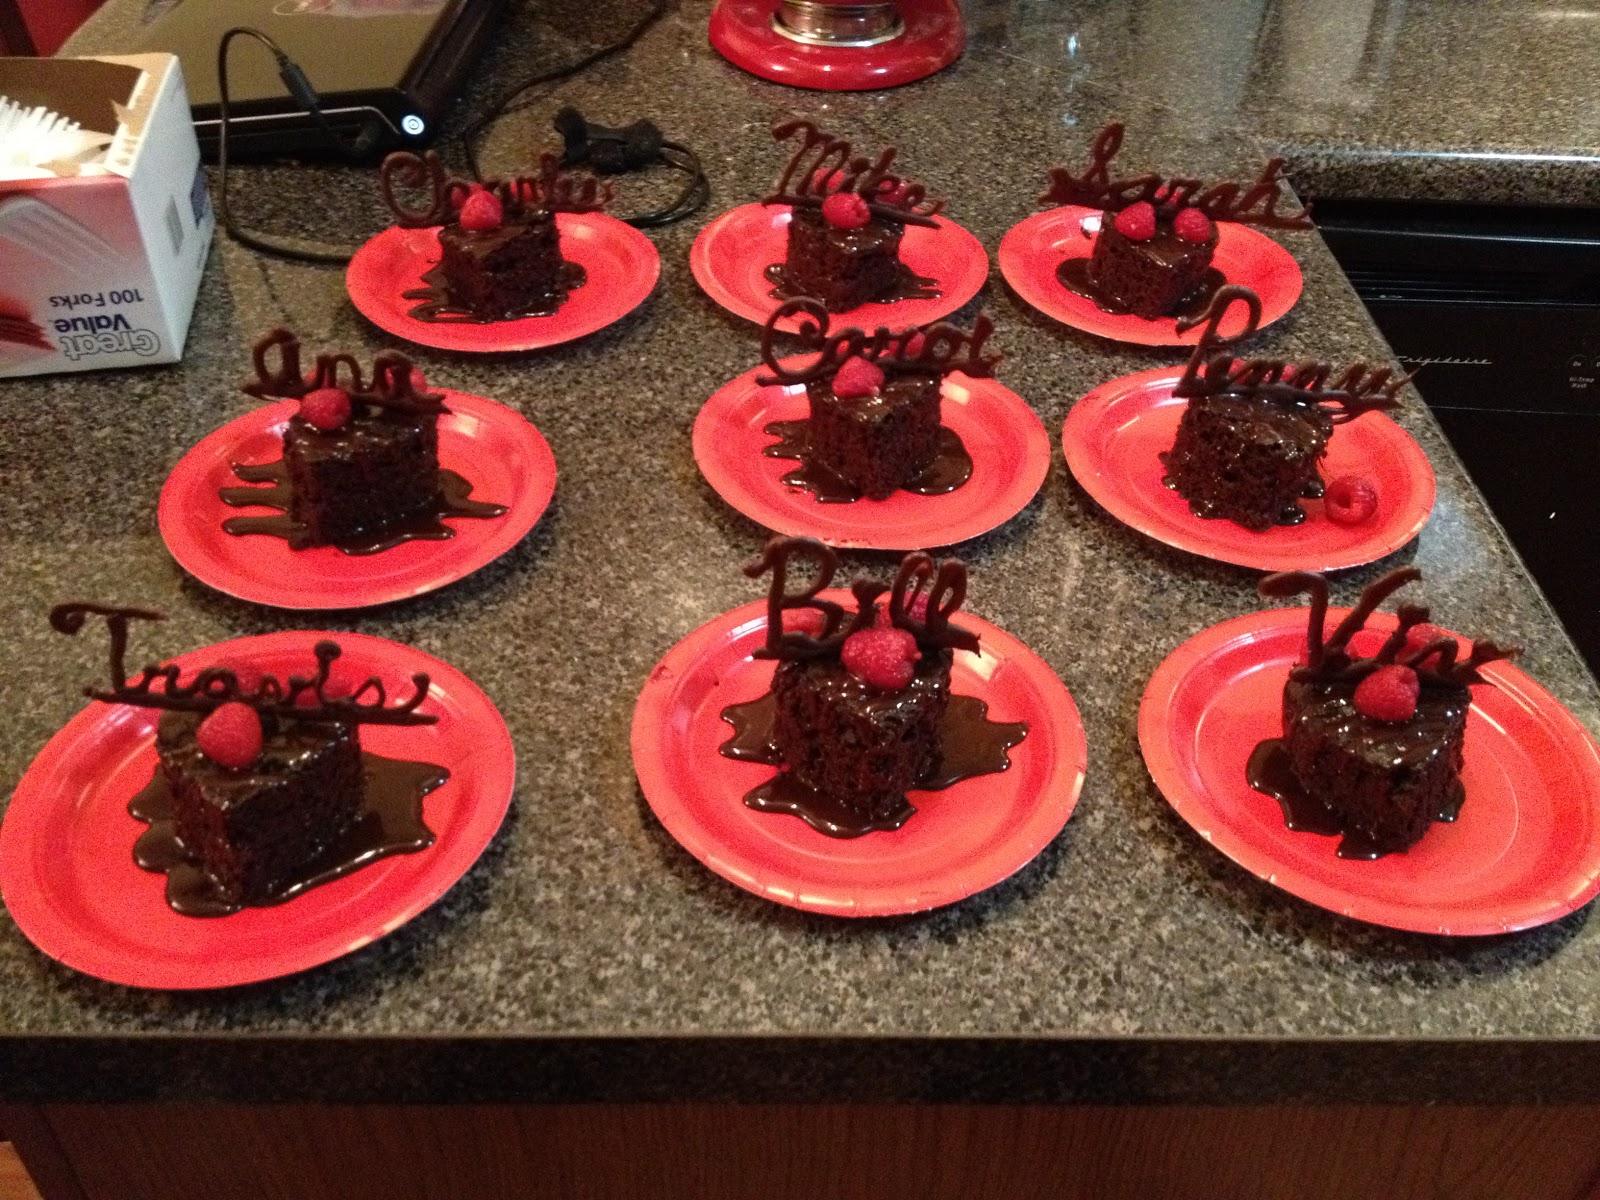 Stitching Momma: Recipe Review: Homemade Skinny Chocolate Cake